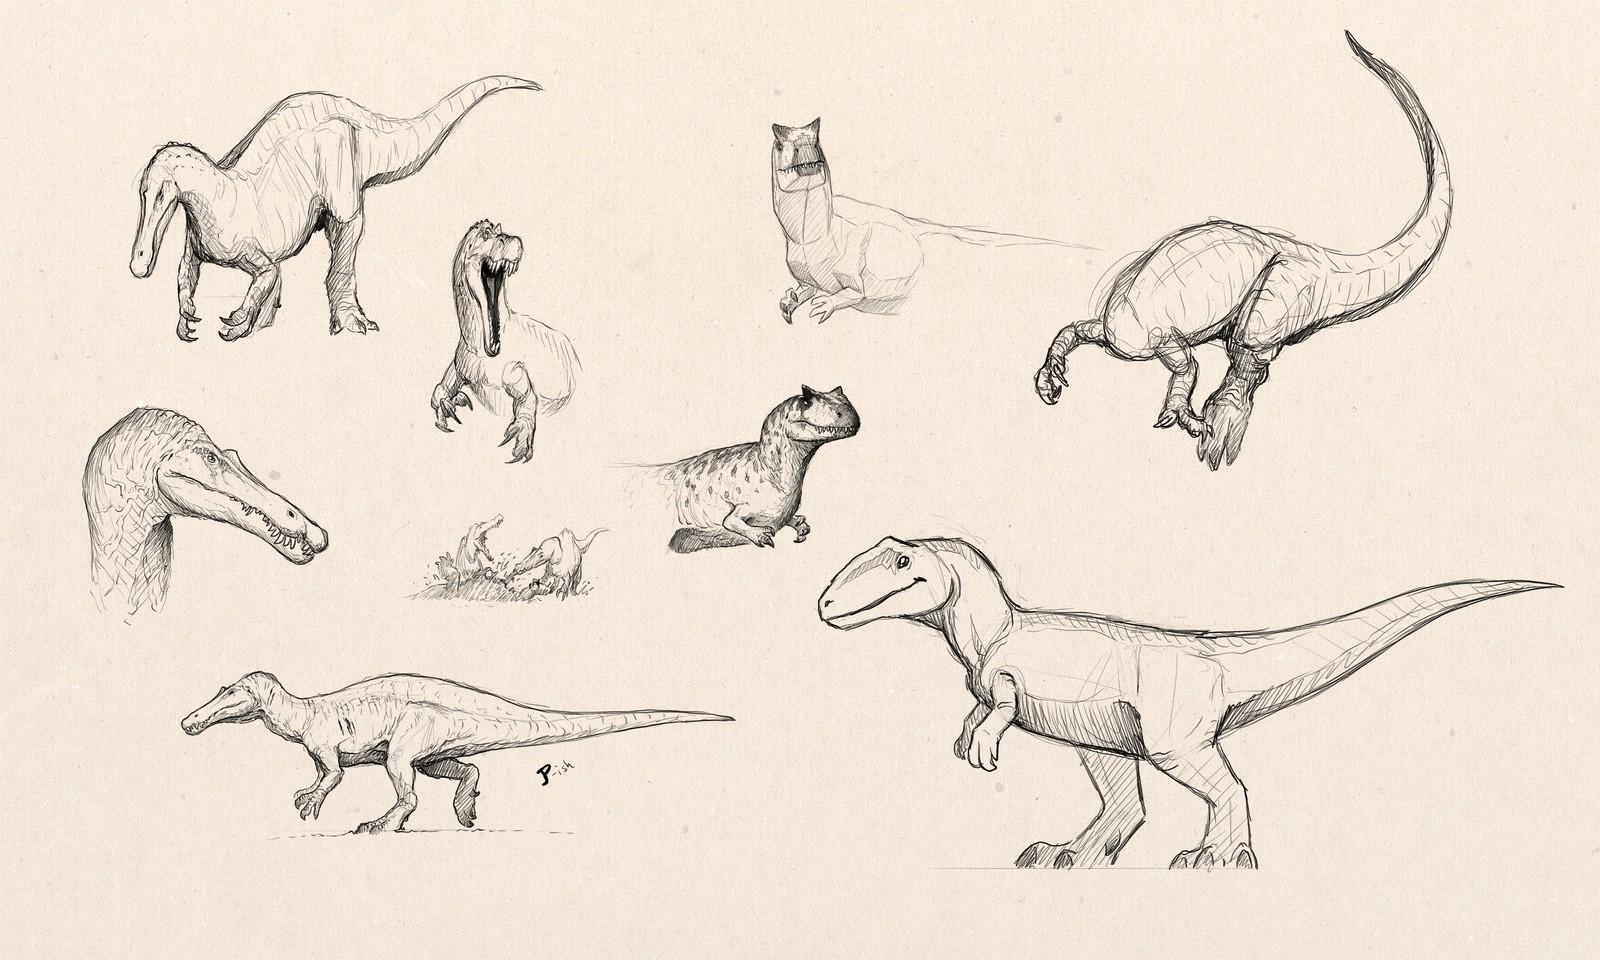 Suchomimus, JPOG's Allosaurus, and a cartoonish Carcharodontosaurus